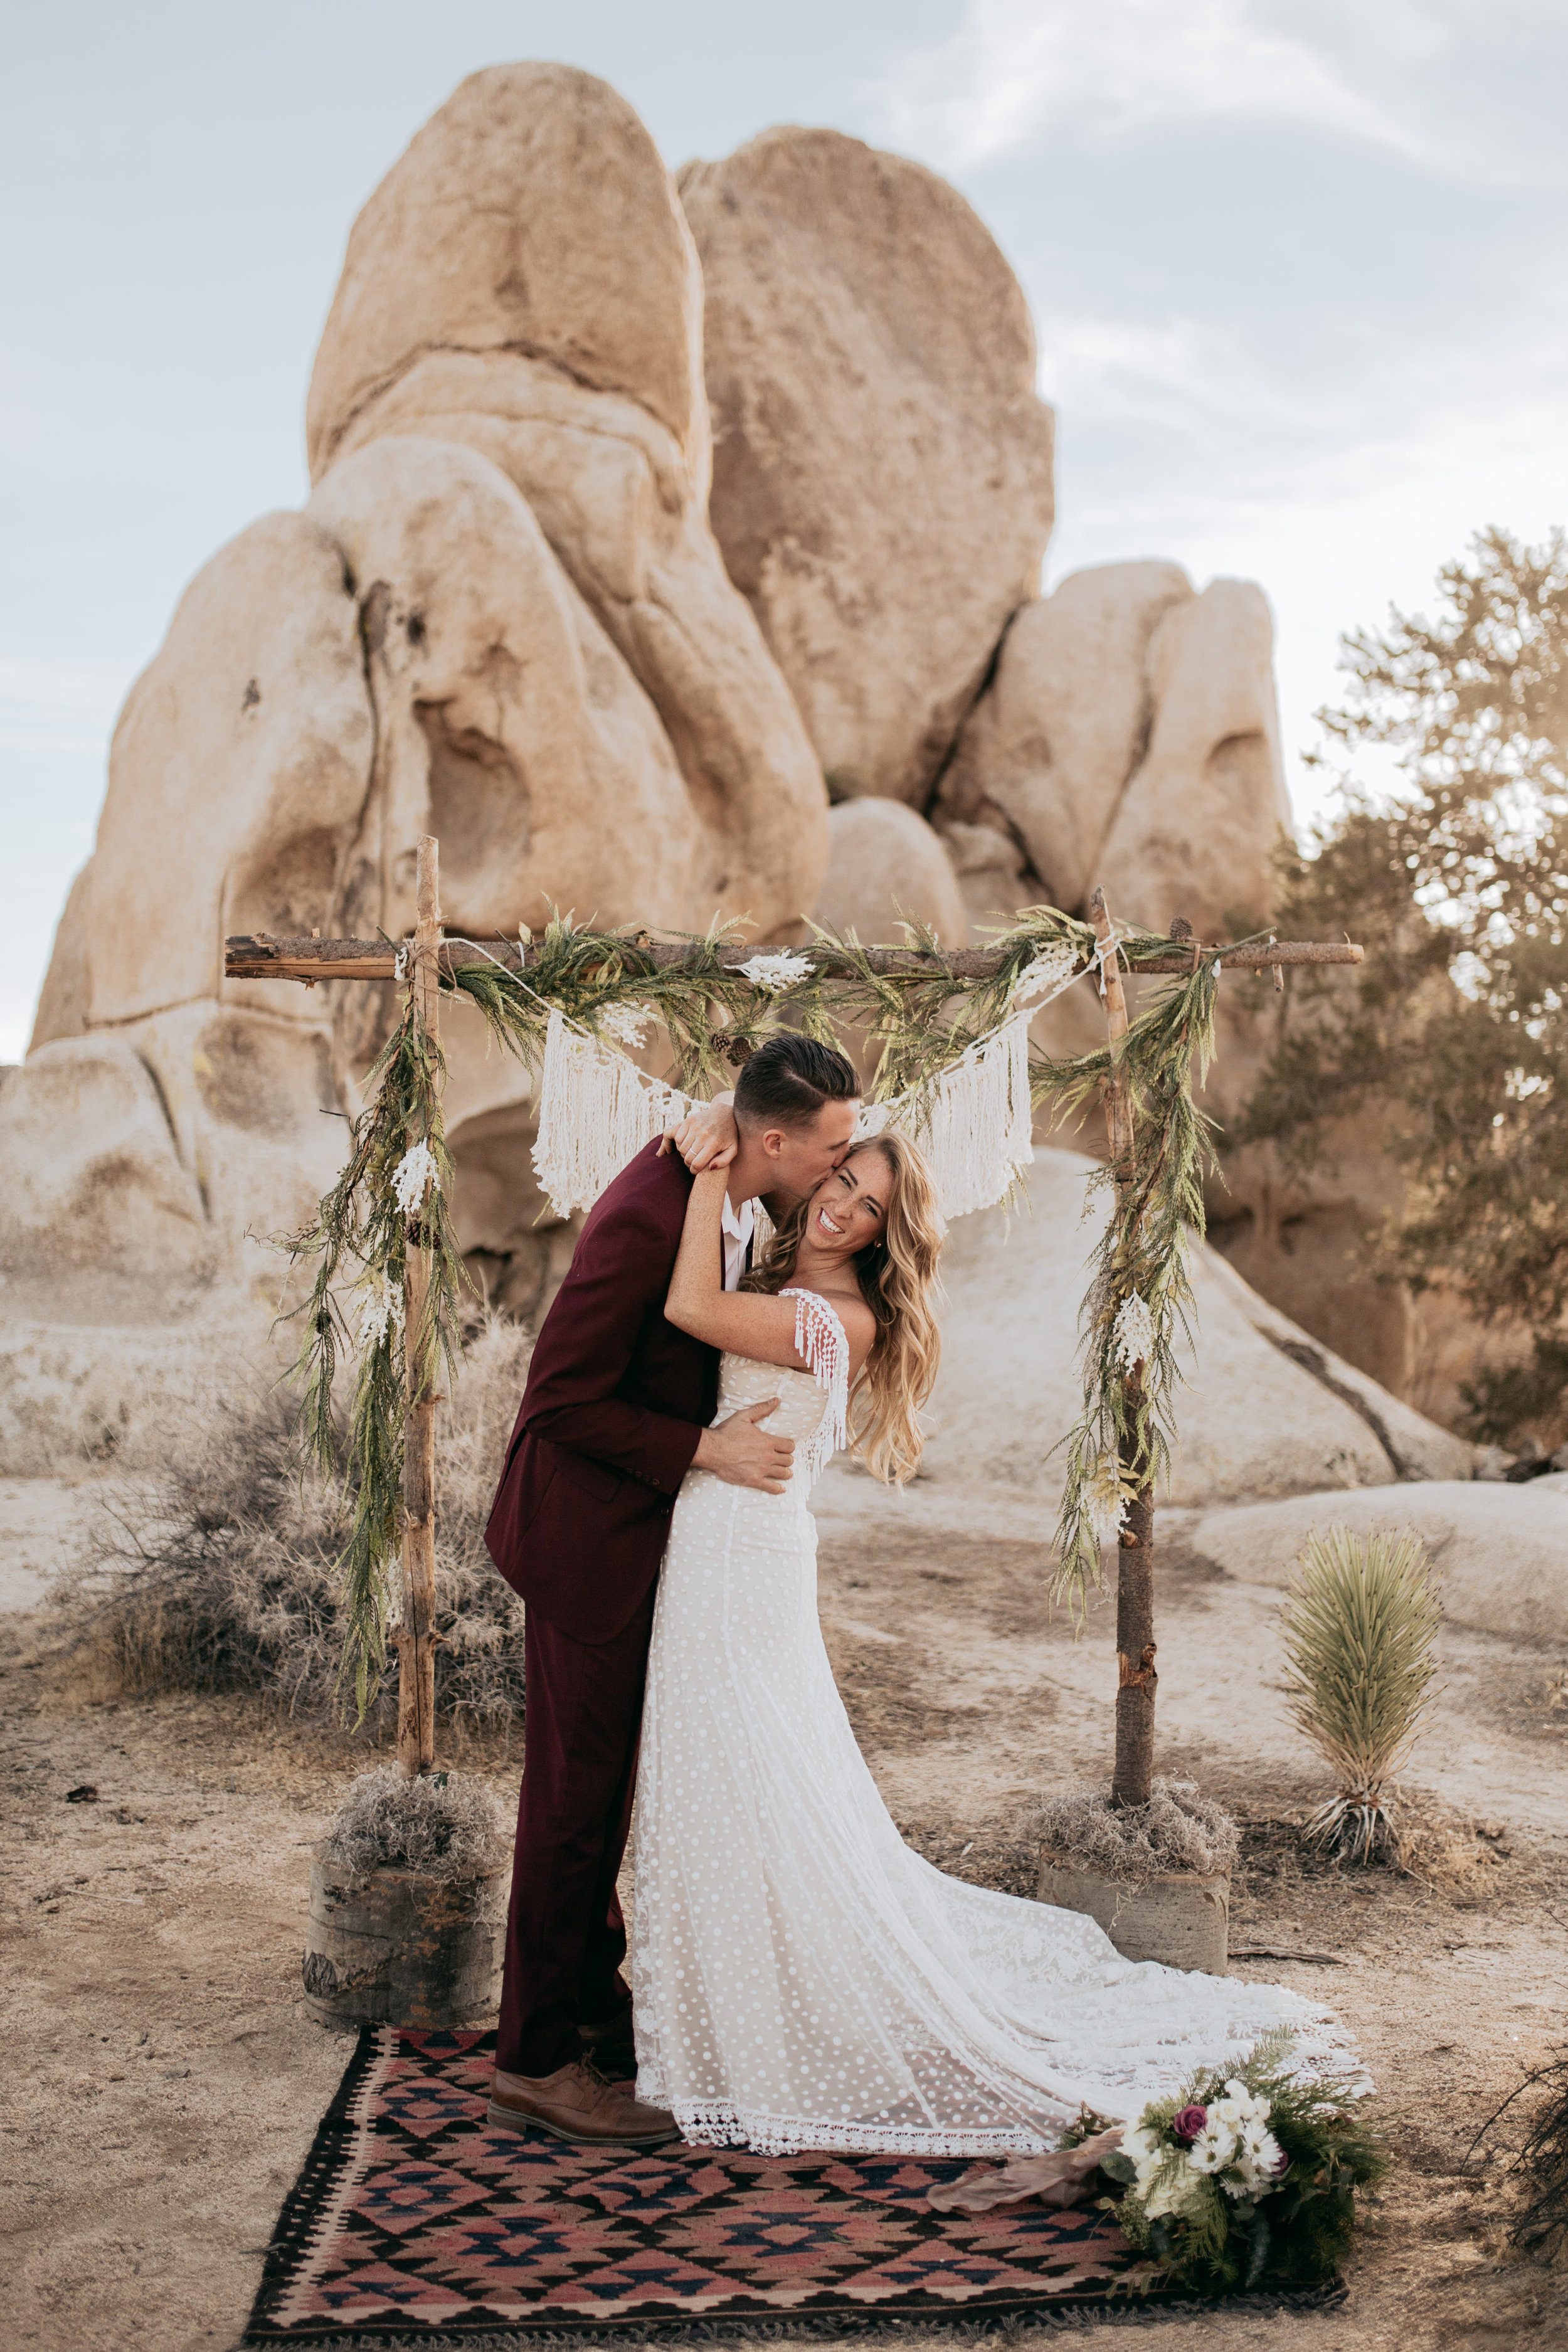 palmsprings_joshuatree_california_wedding_photographer-28.jpg